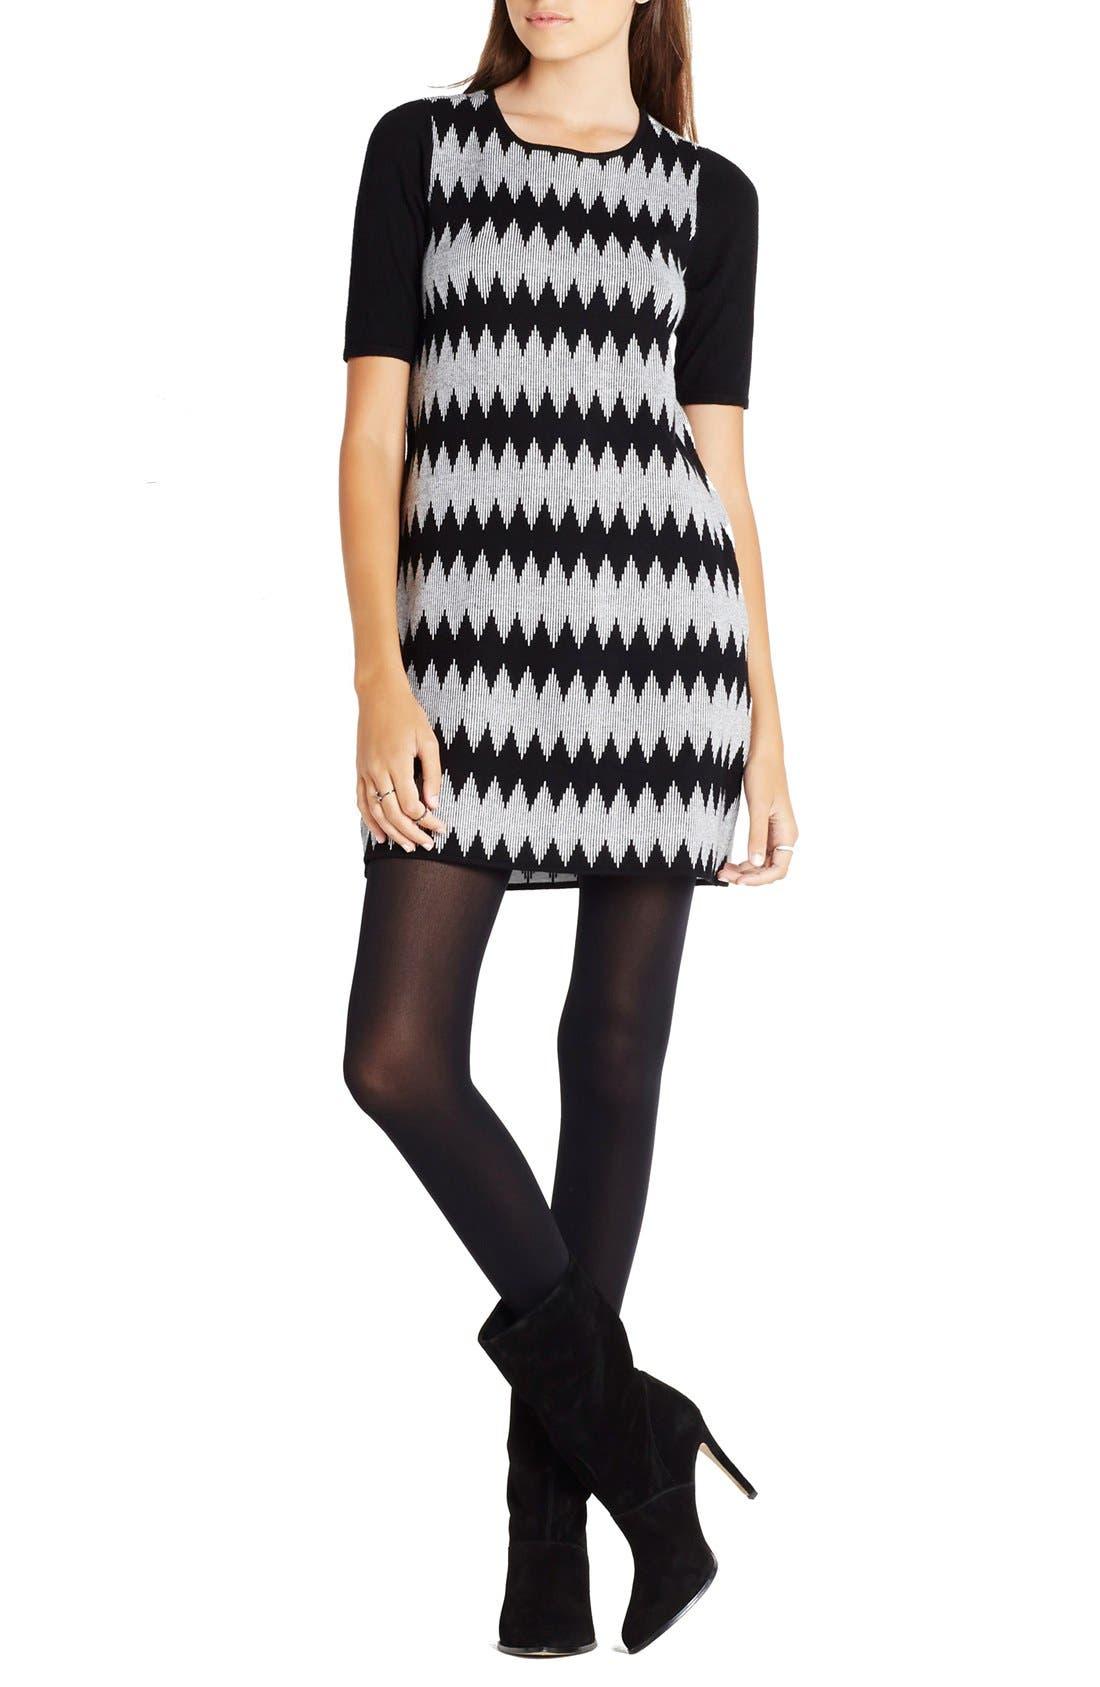 Alternate Image 1 Selected - BCBGeneration Jacquard Shift Sweater Dress